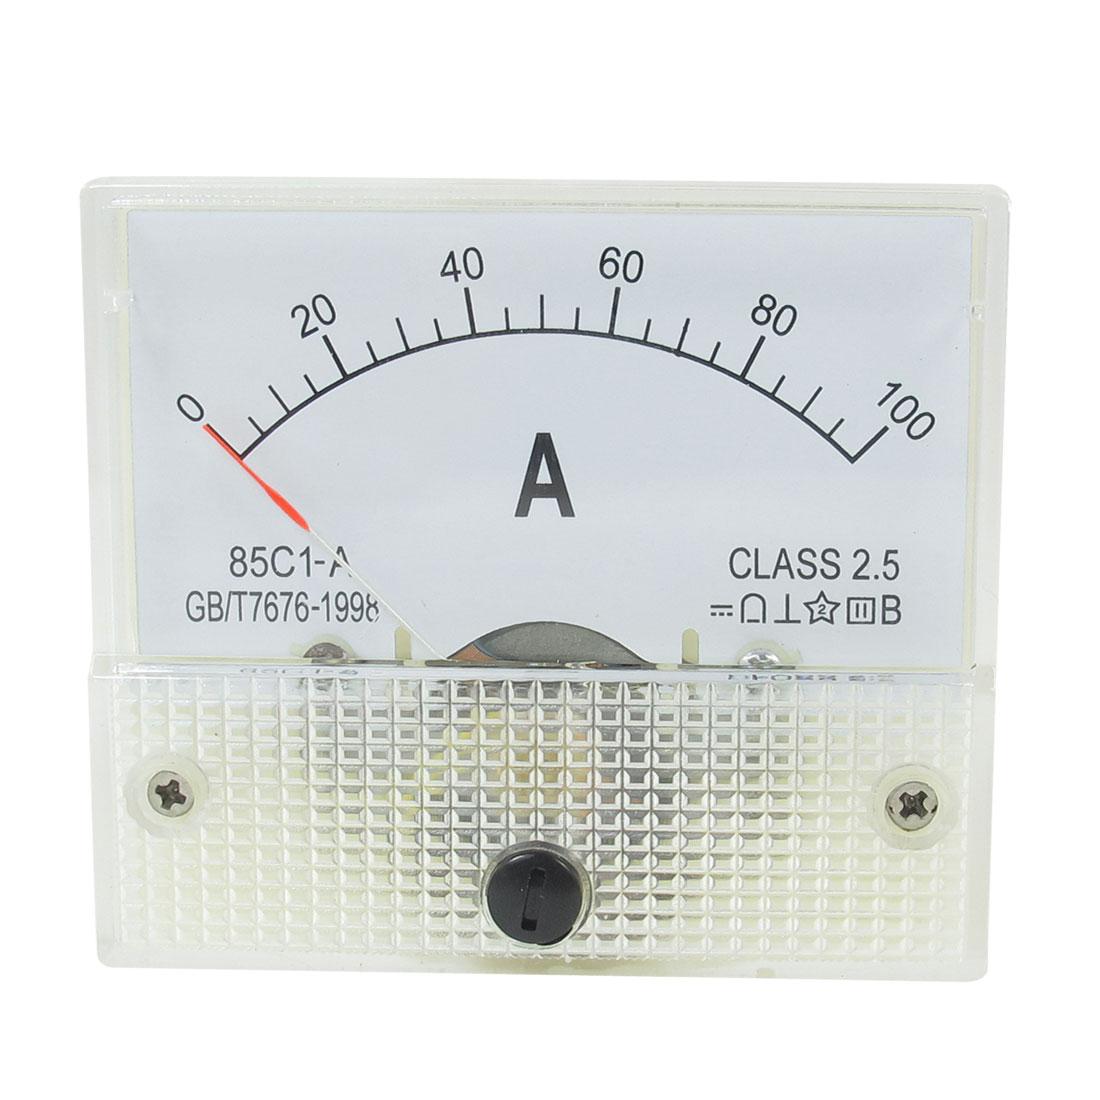 Plastic Housing DC 0-100A Range Analog Panel Meter Amperemeter 85C1-A